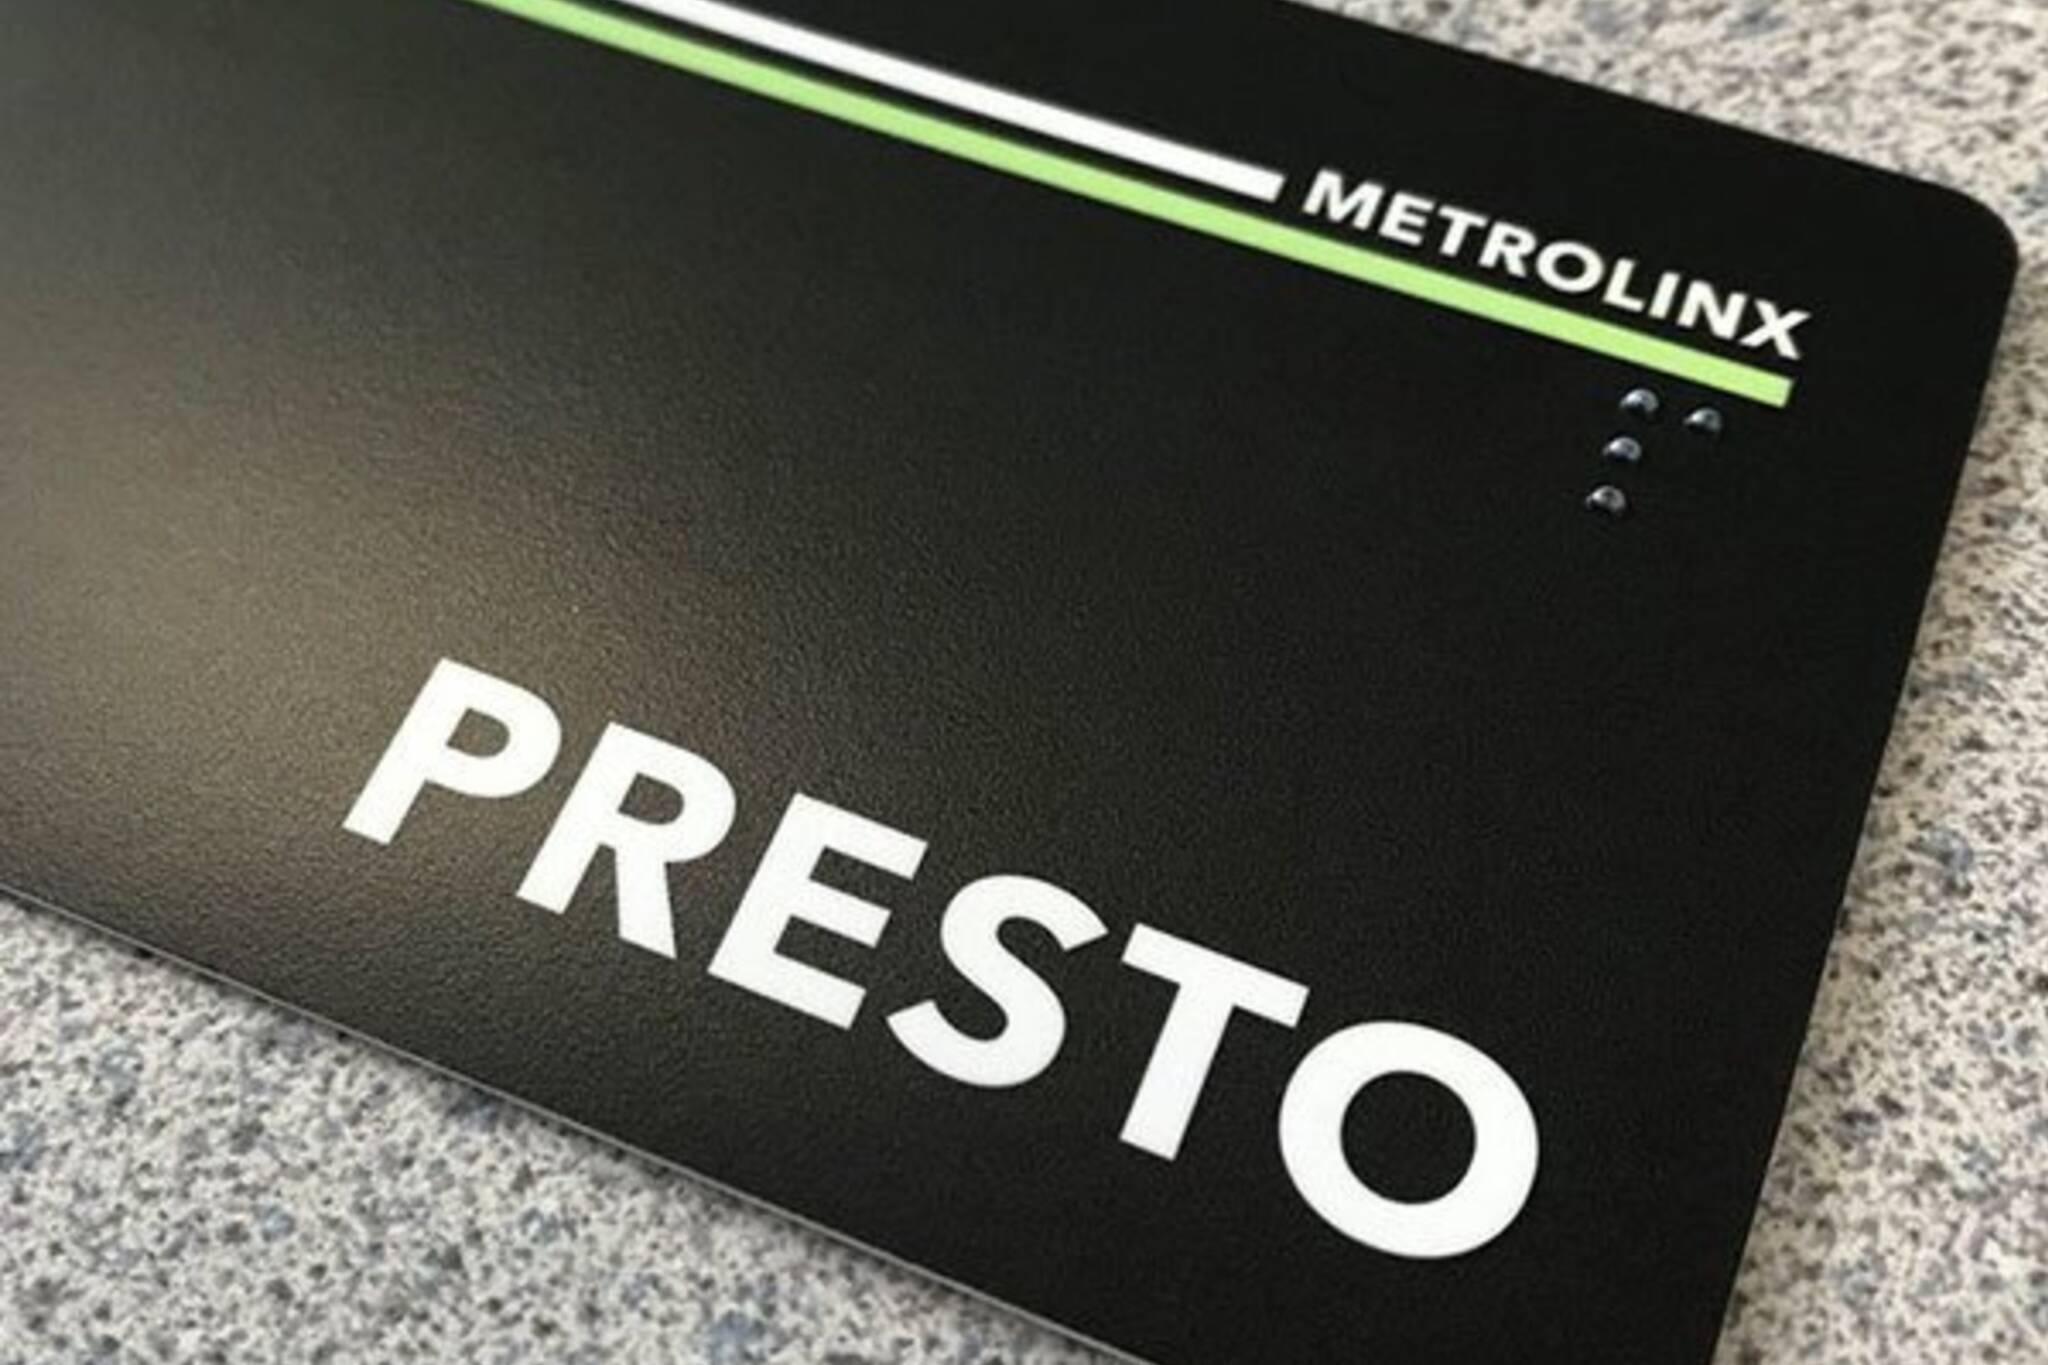 ttc free presto card